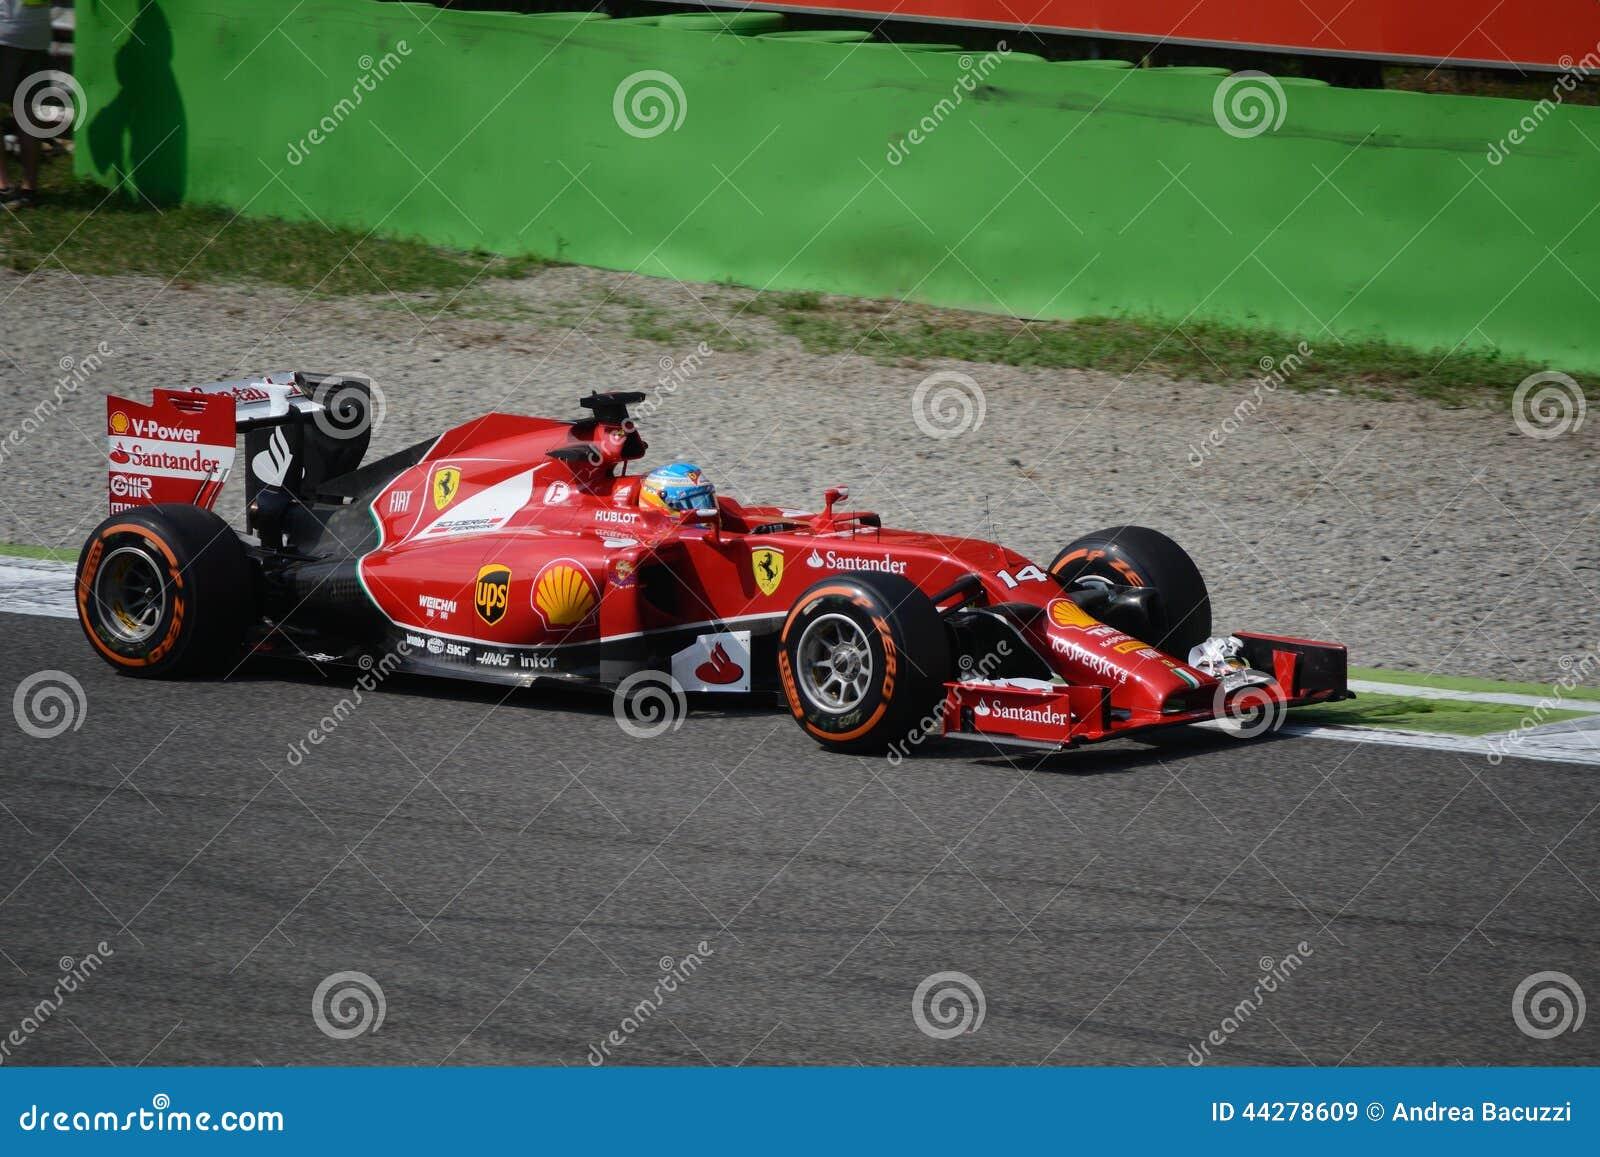 2014 F1 Monza Ferrari F14 Τ - Fernando Alonso